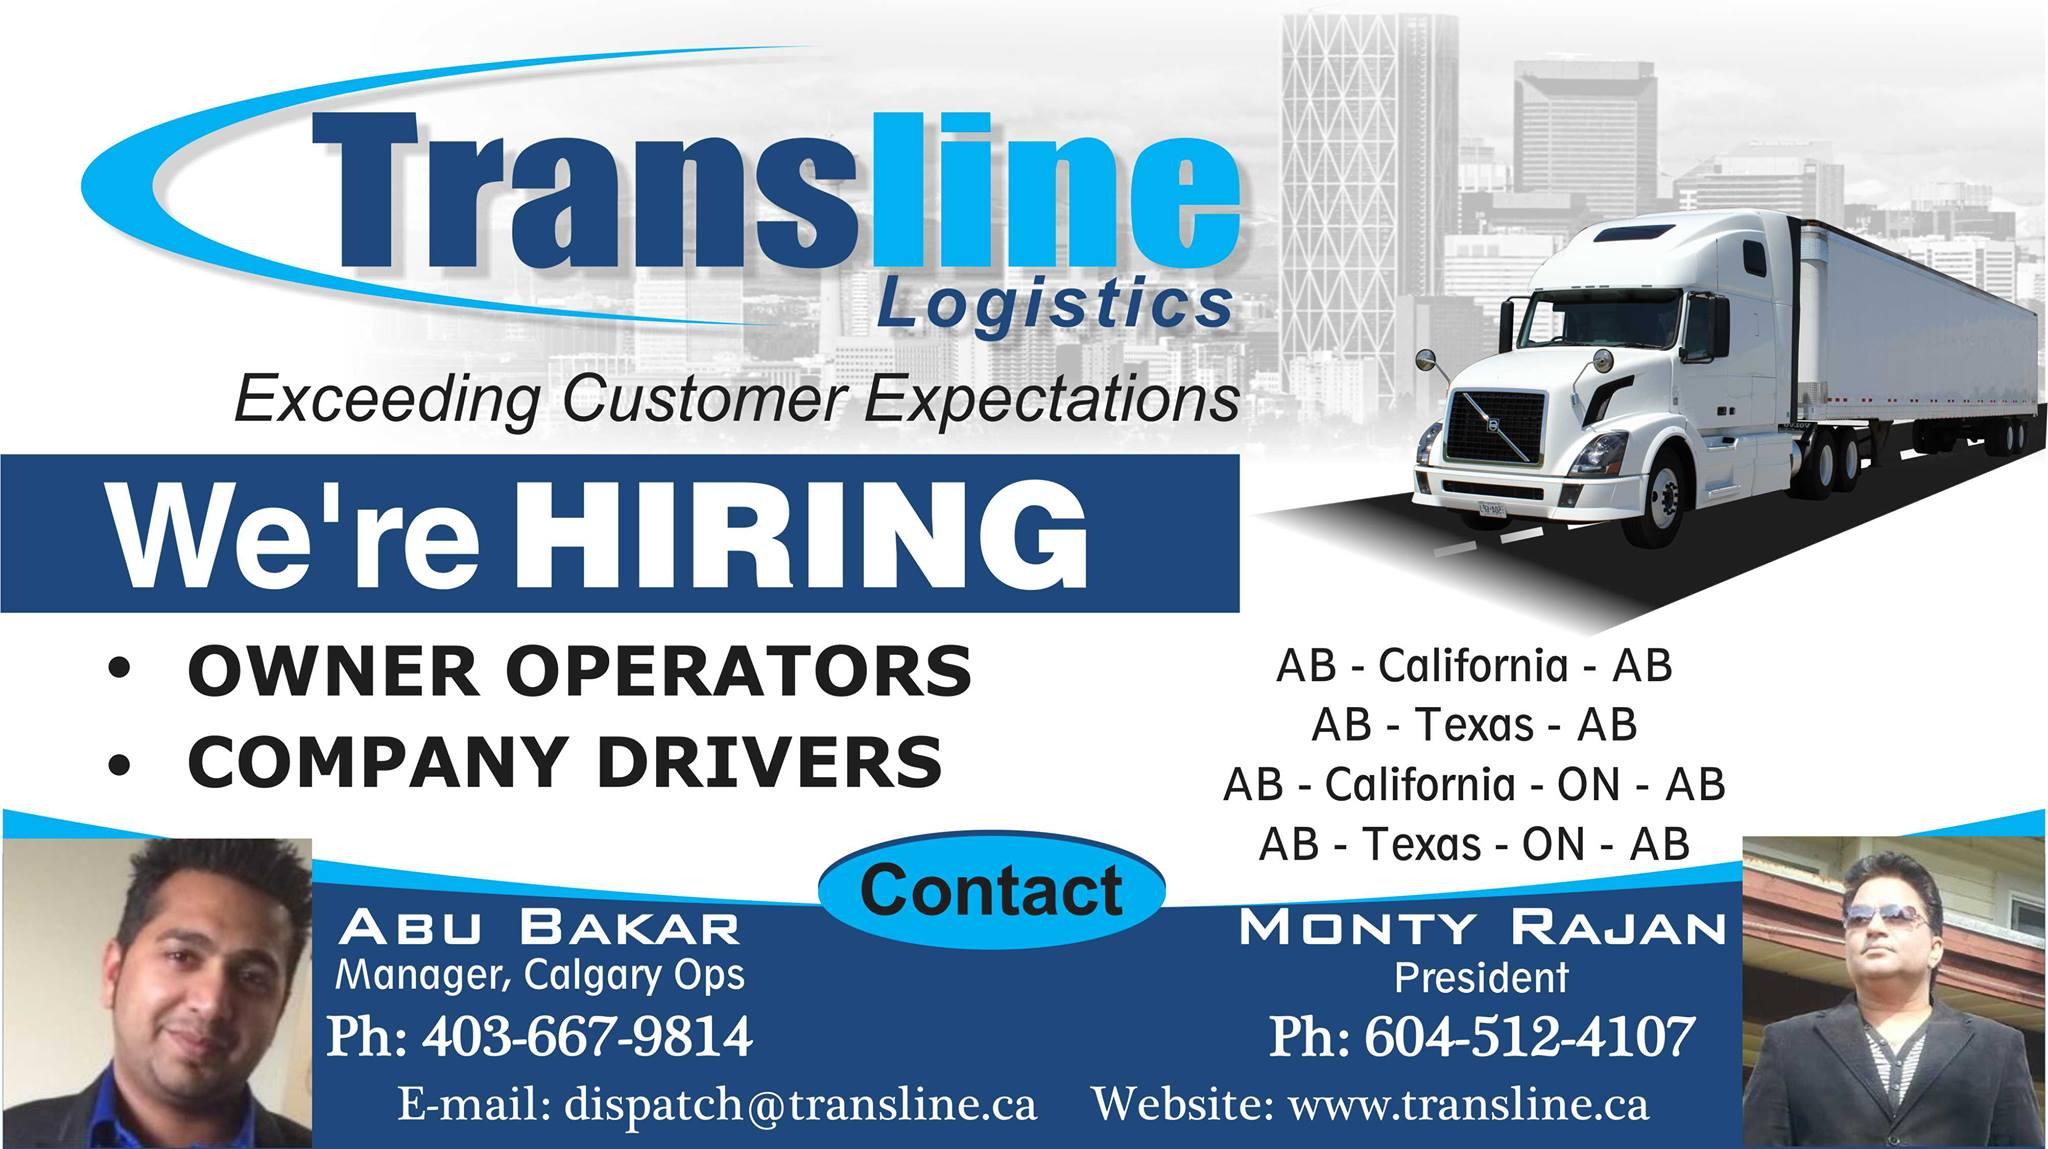 Transline Logistics logo